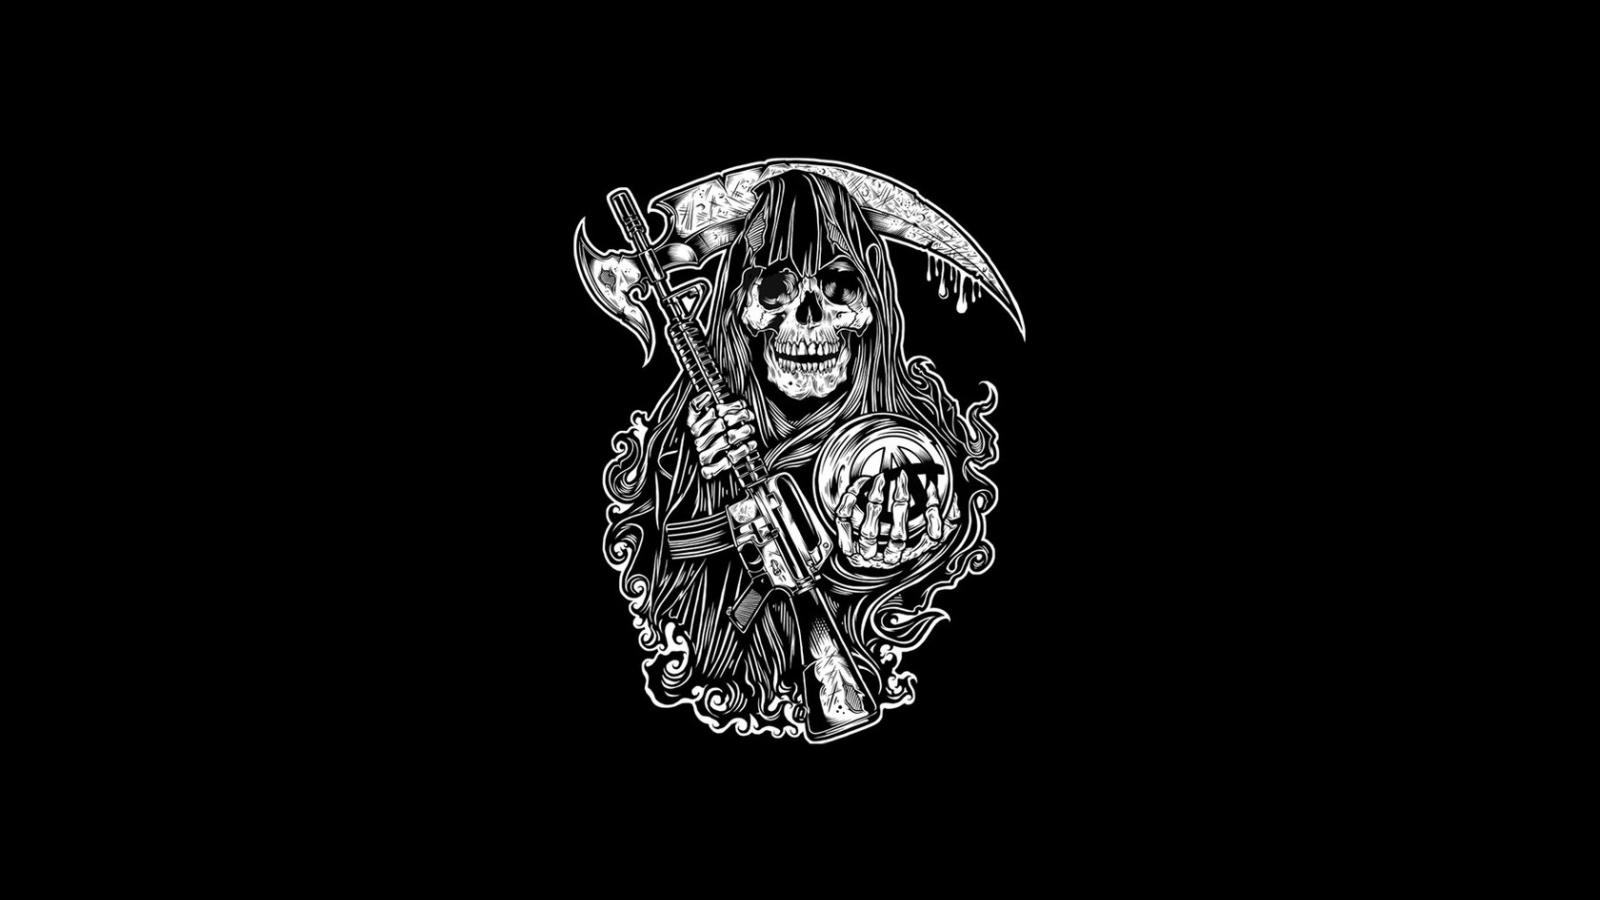 Free Download Samcro Sons Of Anarchy Logo Soa Logo Soa Insignia